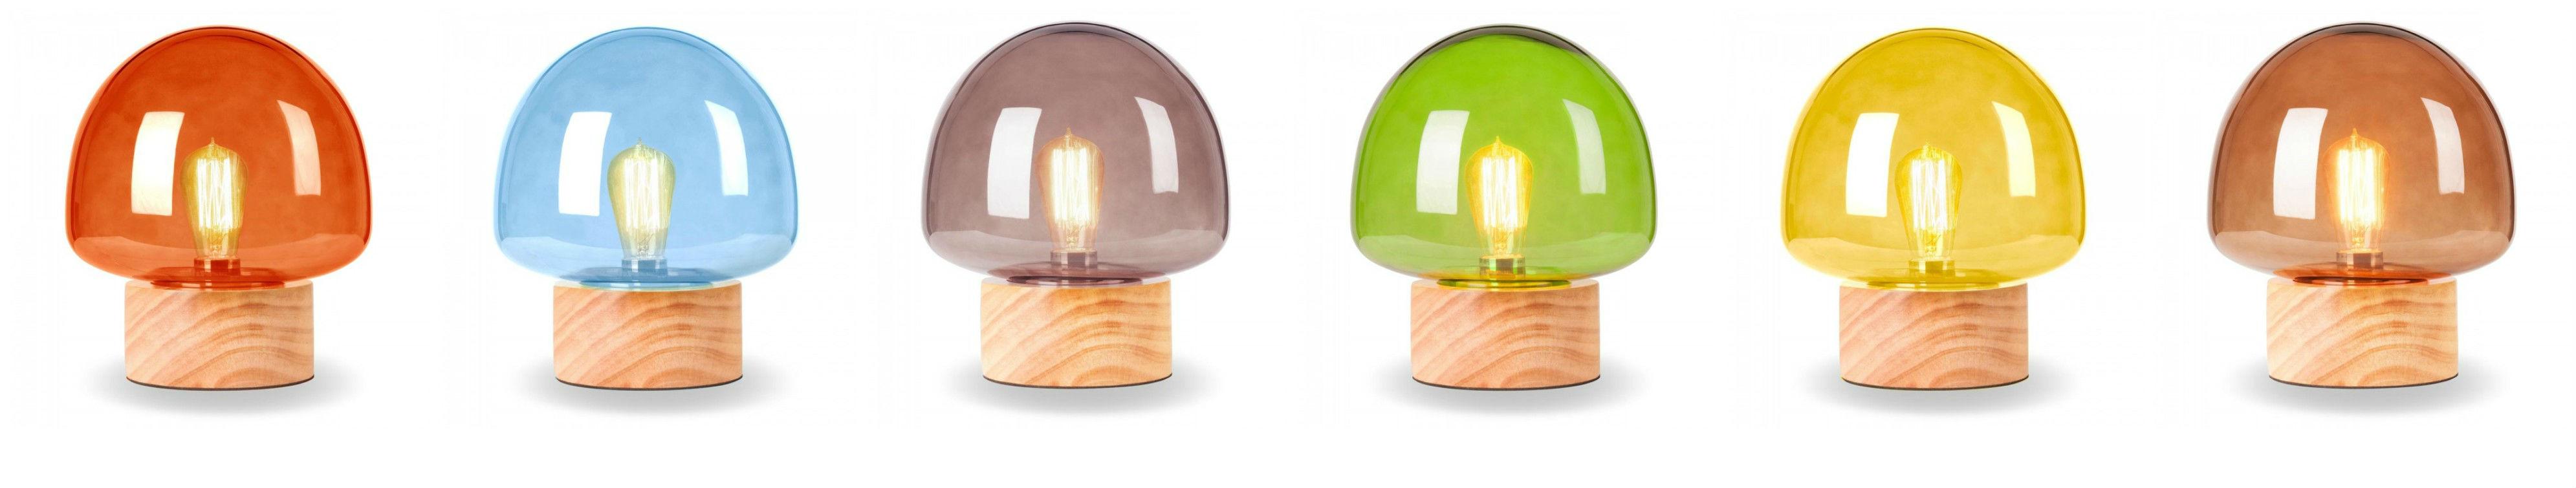 Lampes-design-champignon-Cult-Living-Globe